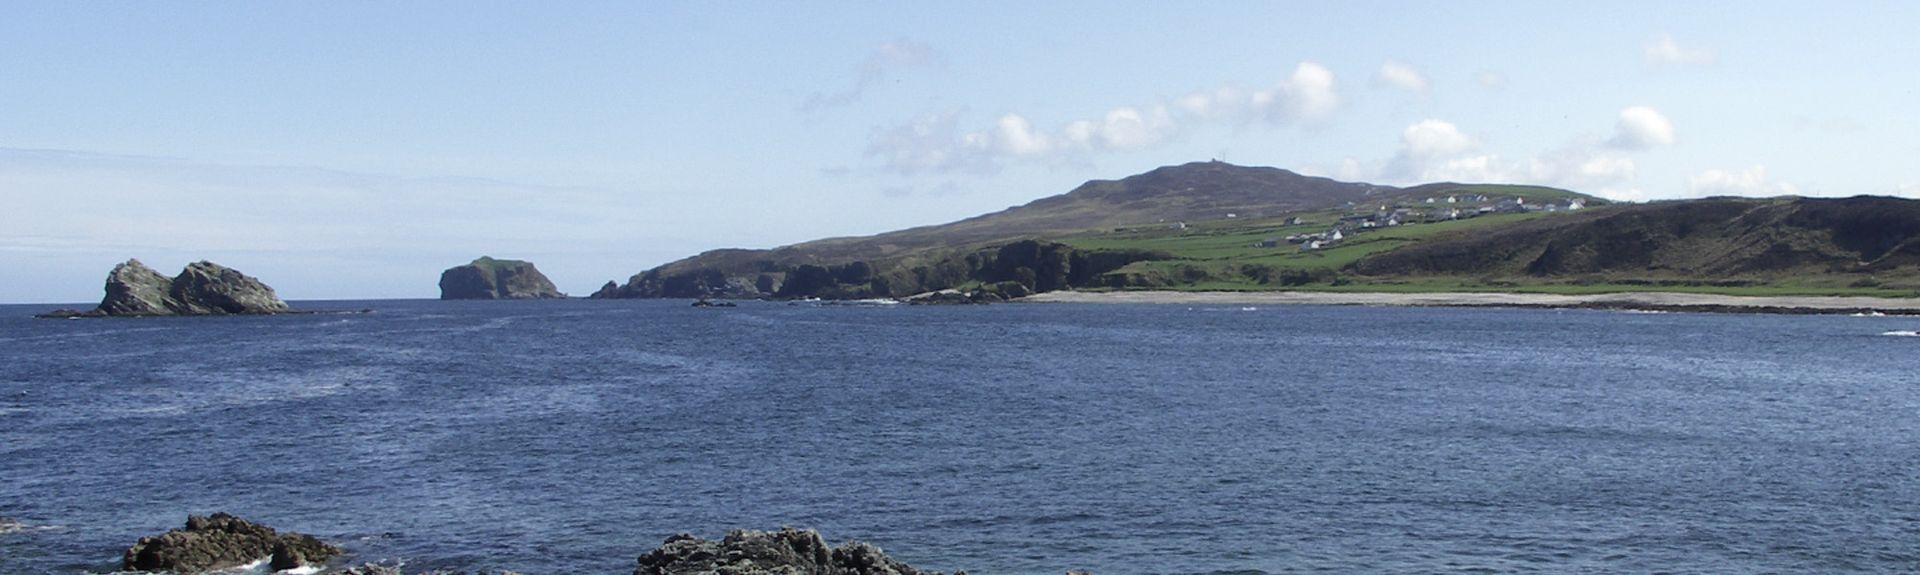 Inishowen Head (strand), Donegal (fylke), Irland